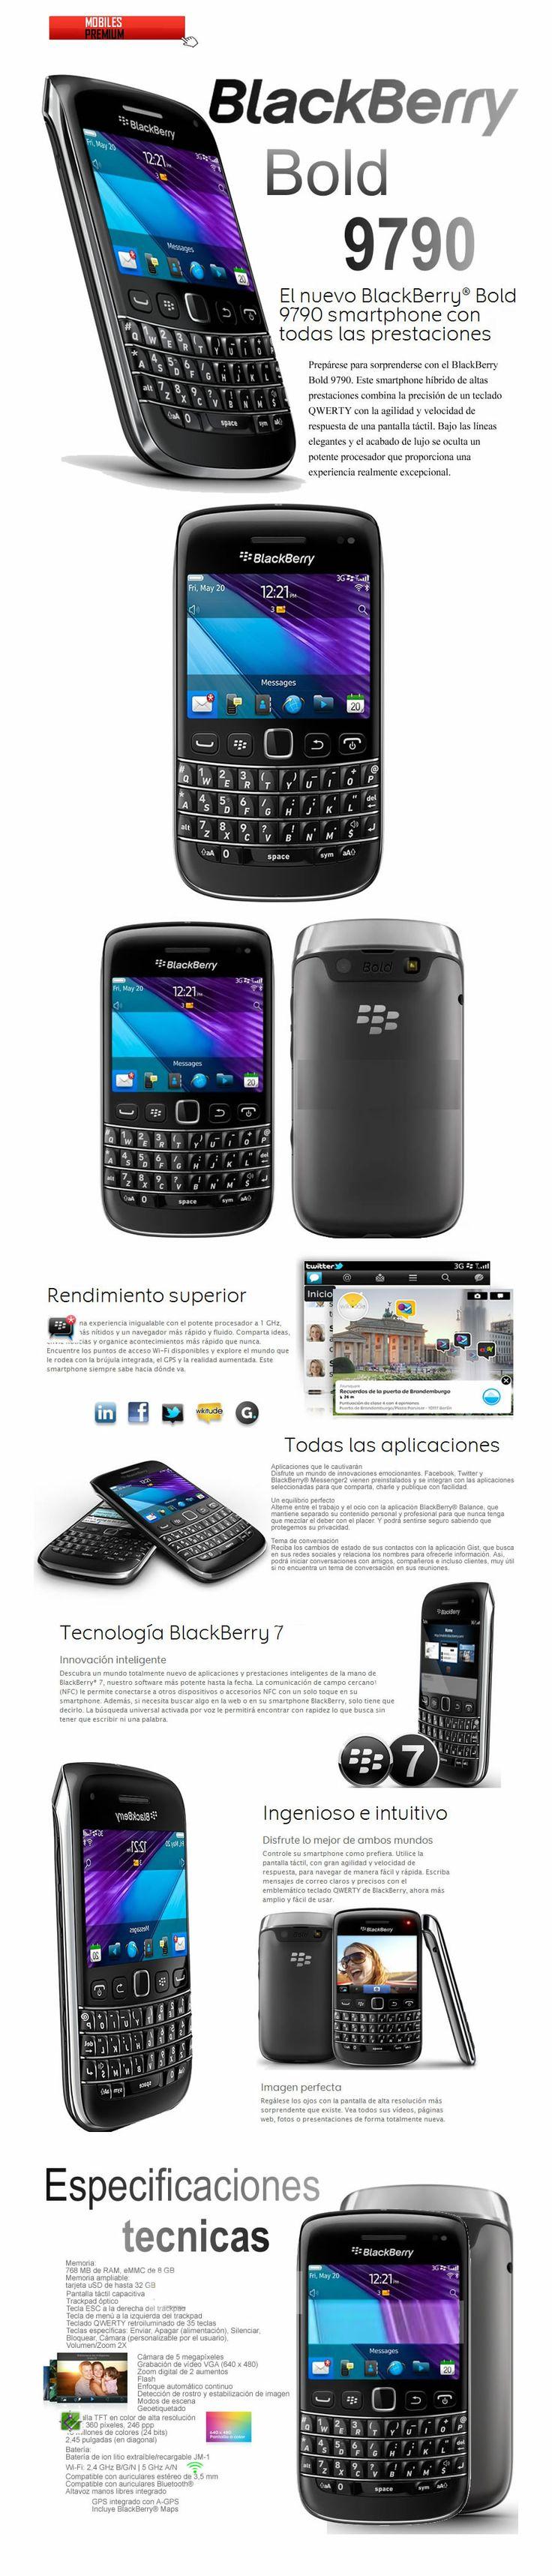 Comprar celular blackberry bold 9790 | venta de blackberry bold 9790 Argentina